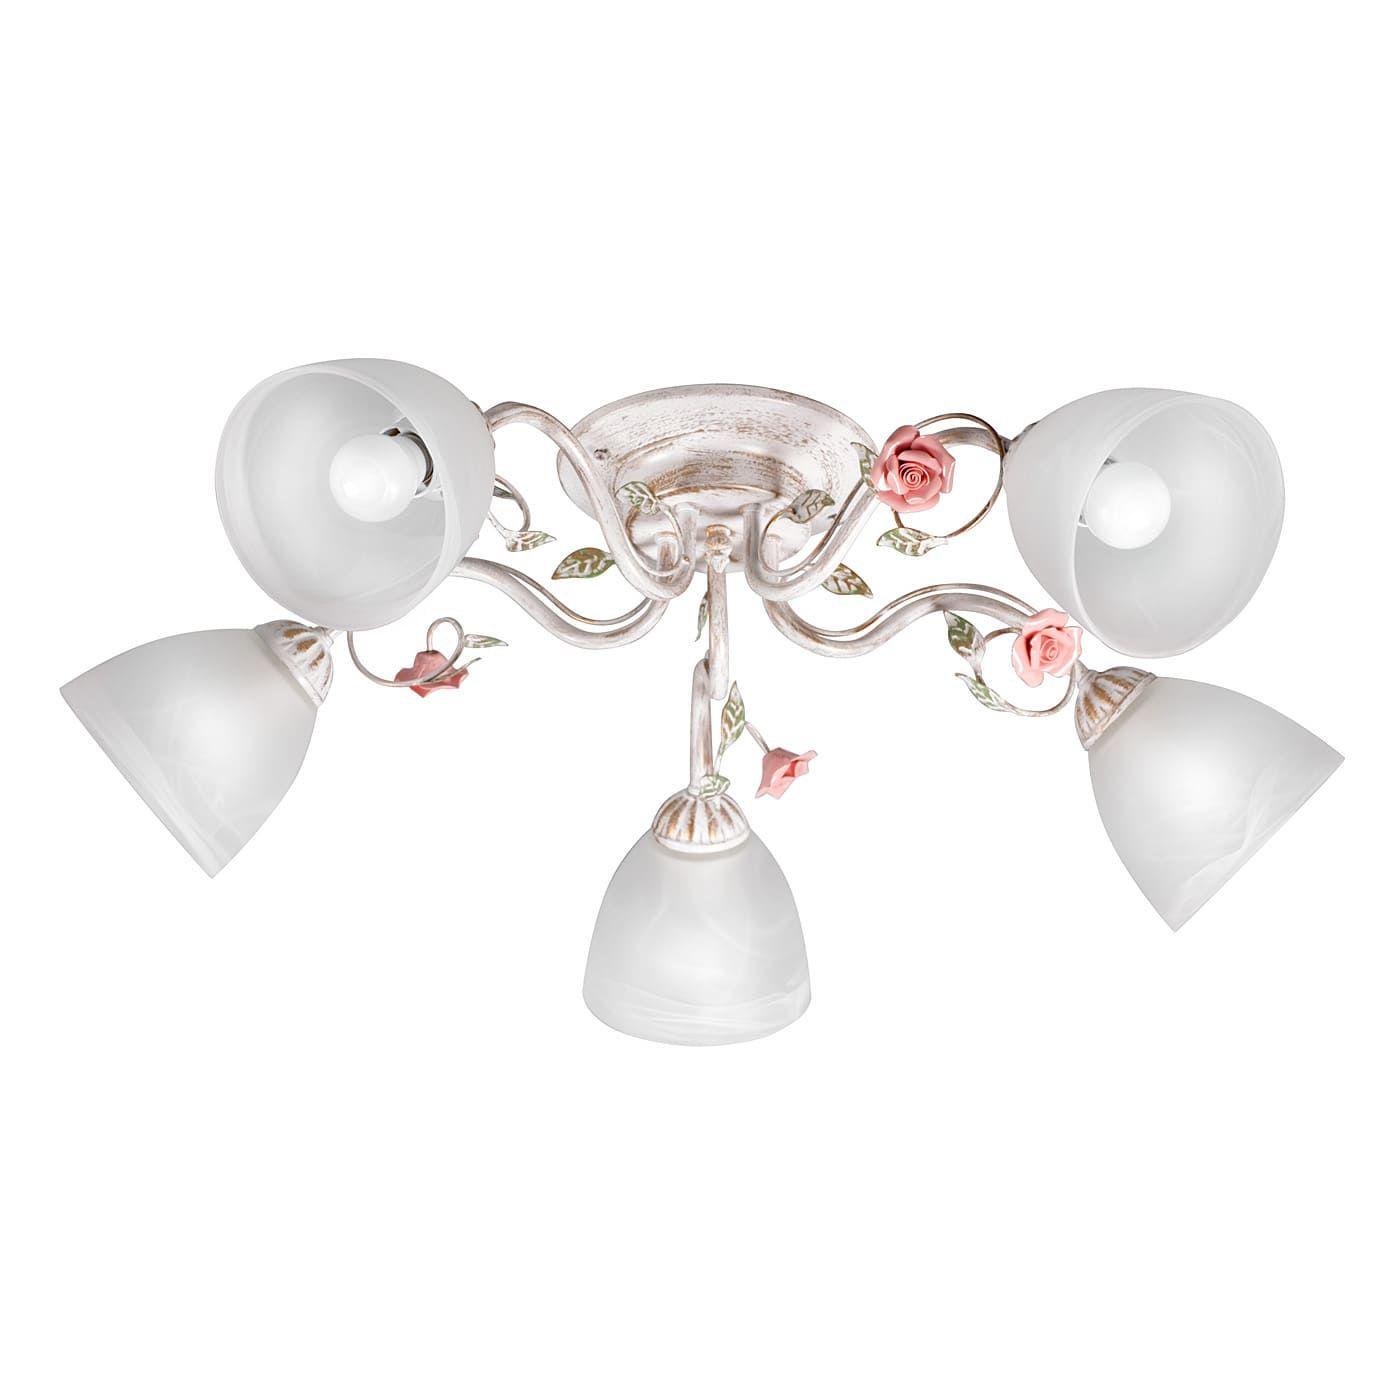 PETRASVET / Ceiling chandelier S2186-5, 5xE27 max. 60W